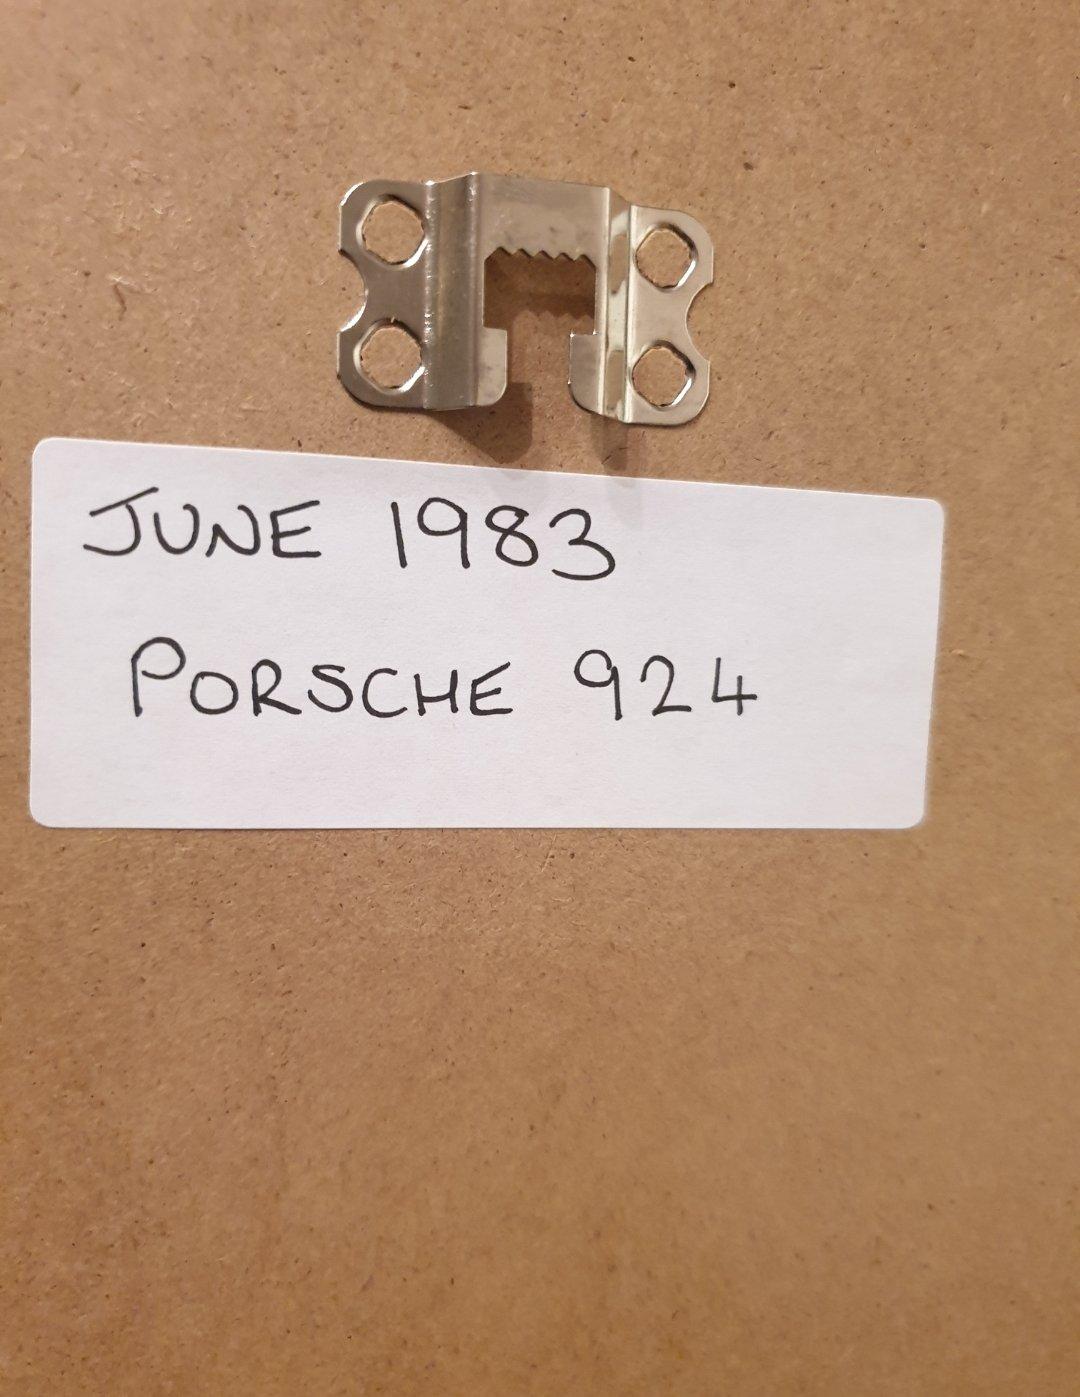 1983 Porsche 924 Framed Advert Original  For Sale (picture 2 of 2)